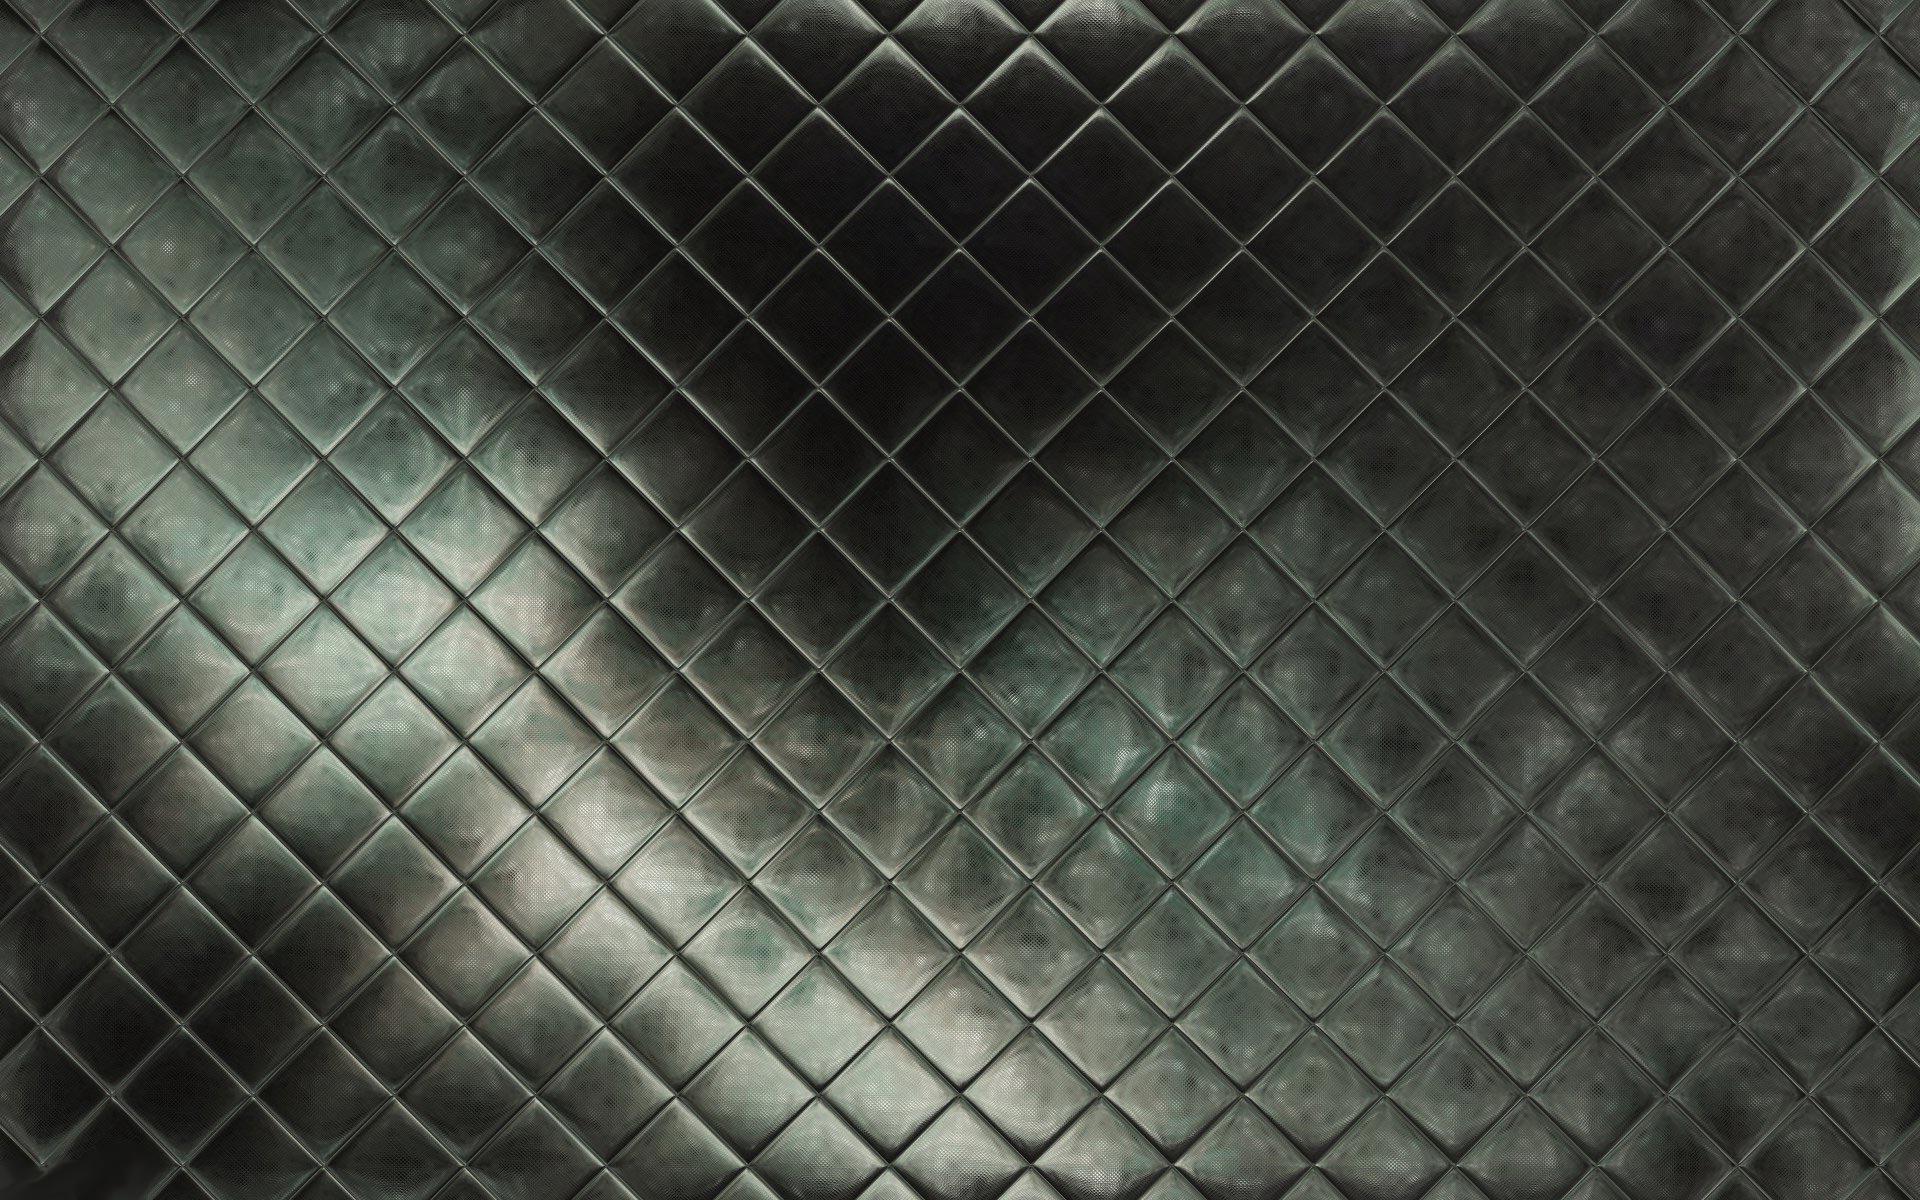 Shiny leather pattern wallpaper 179 1920x1200